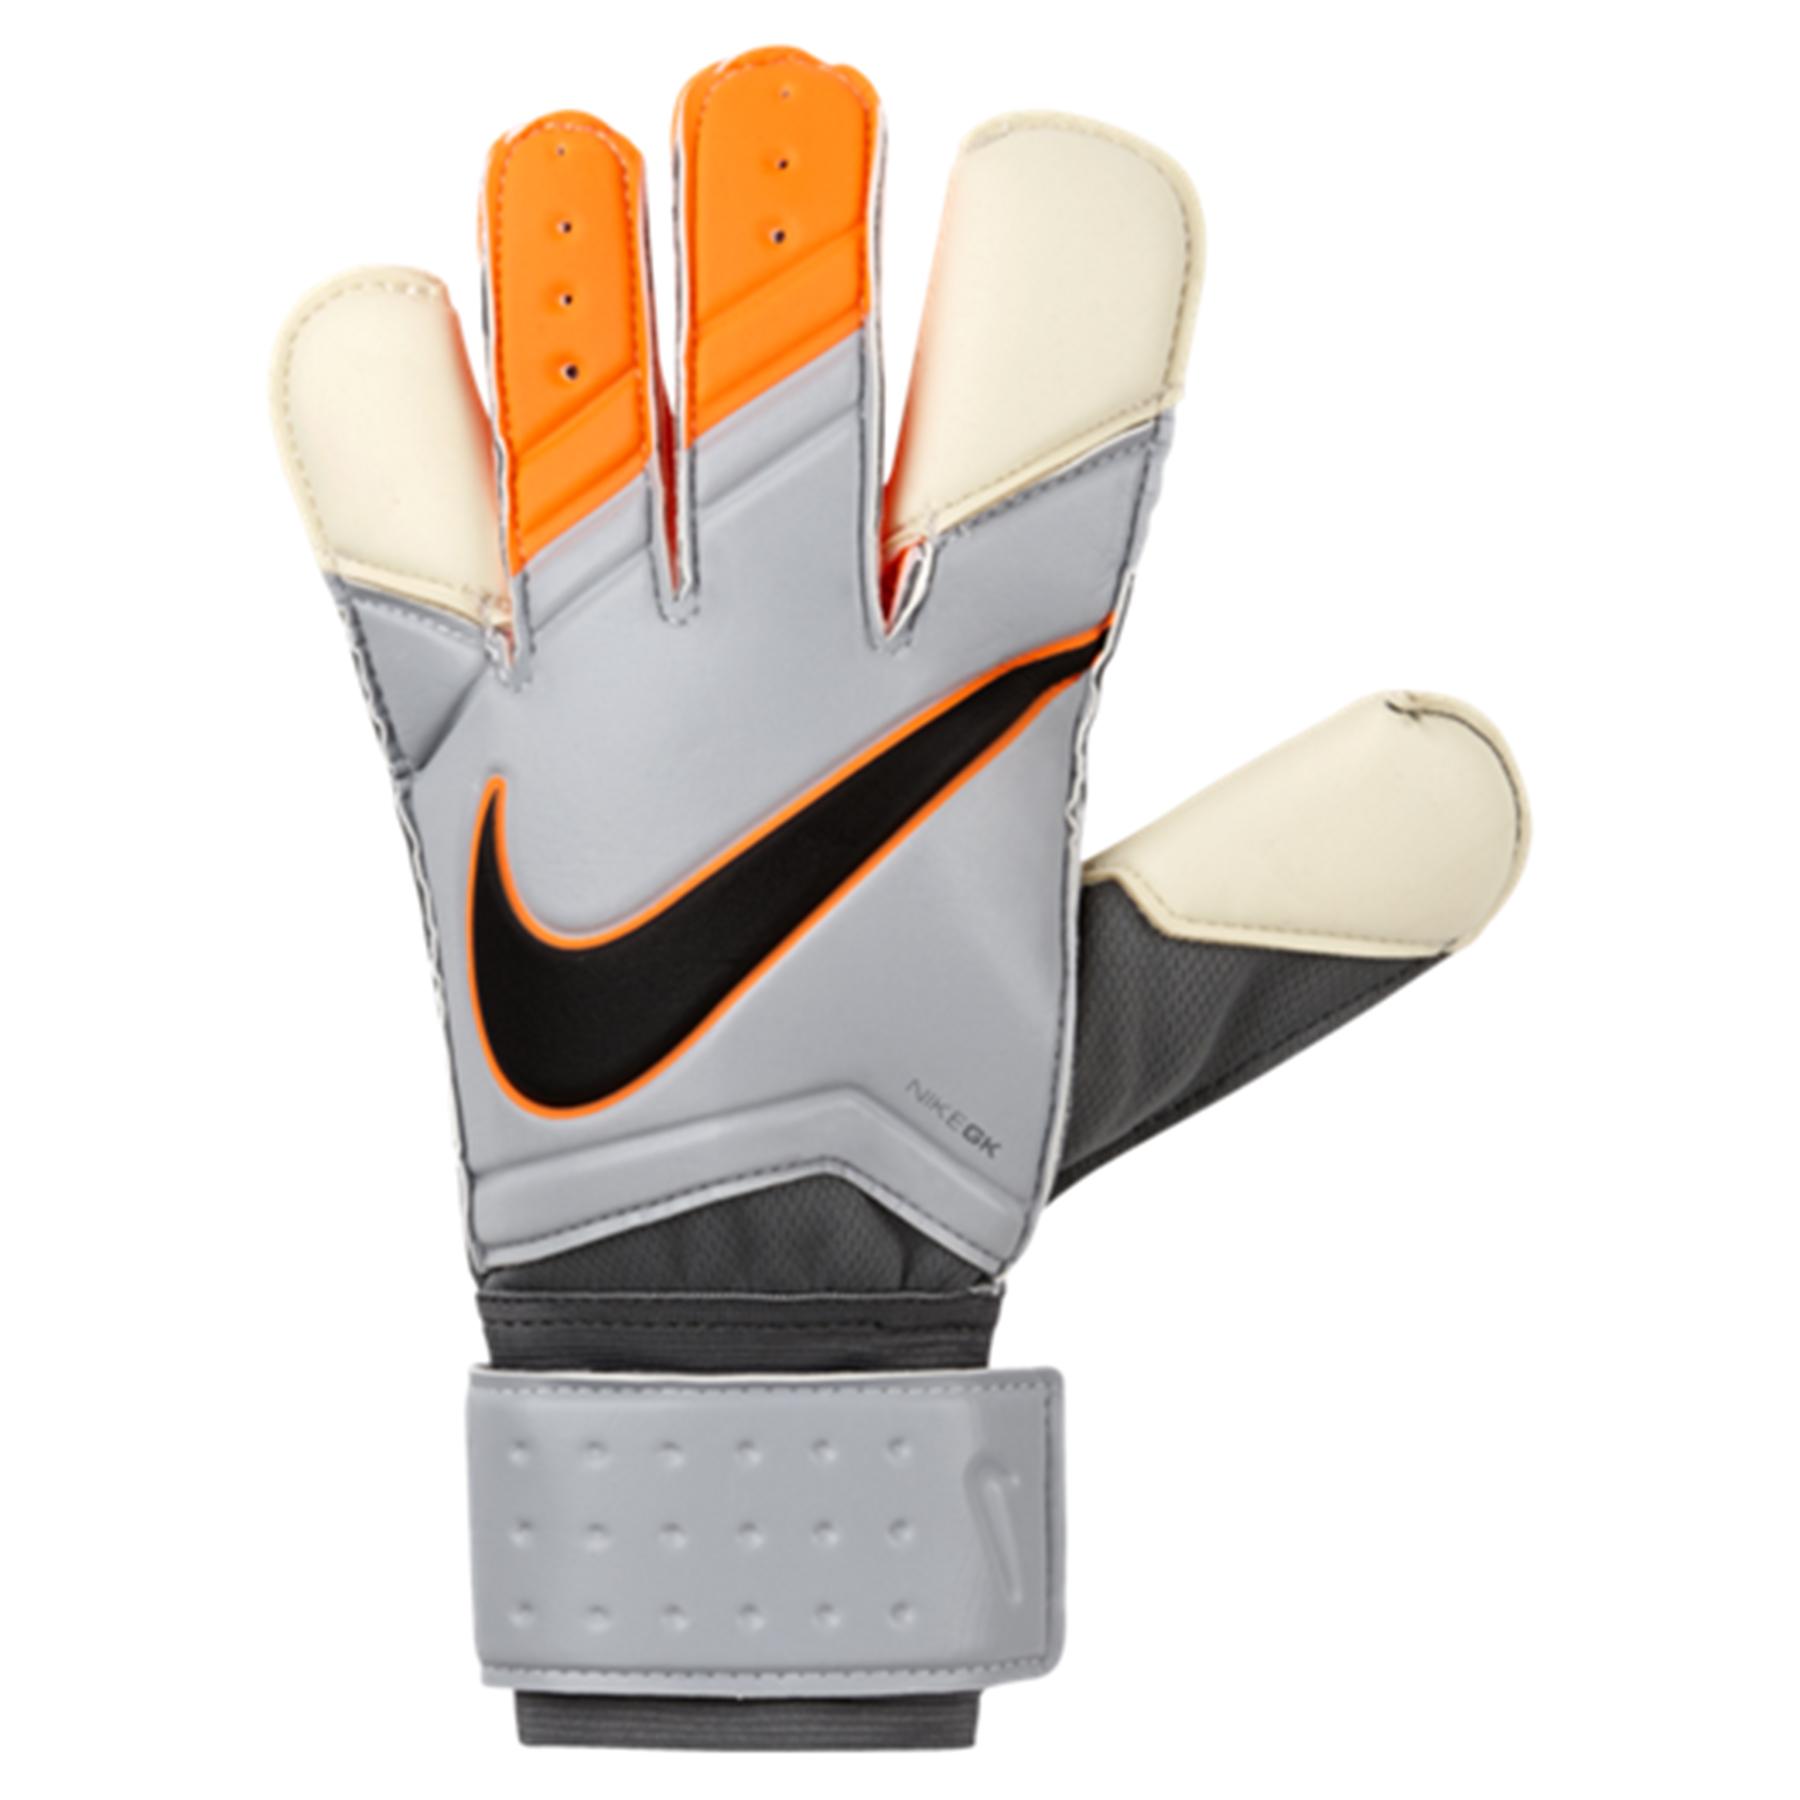 Nike Match Goalkeeper Gloves Black